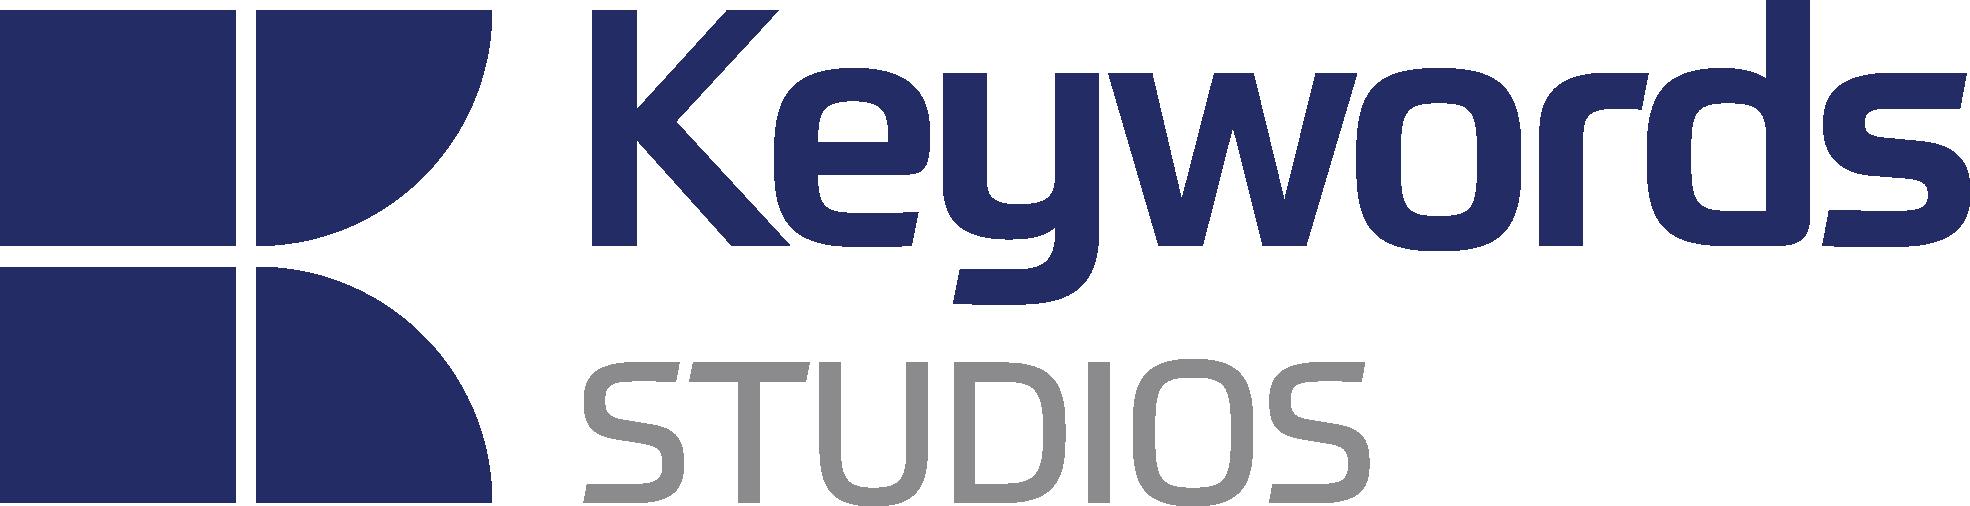 KEYWORDS STUDIOS PLC Logo